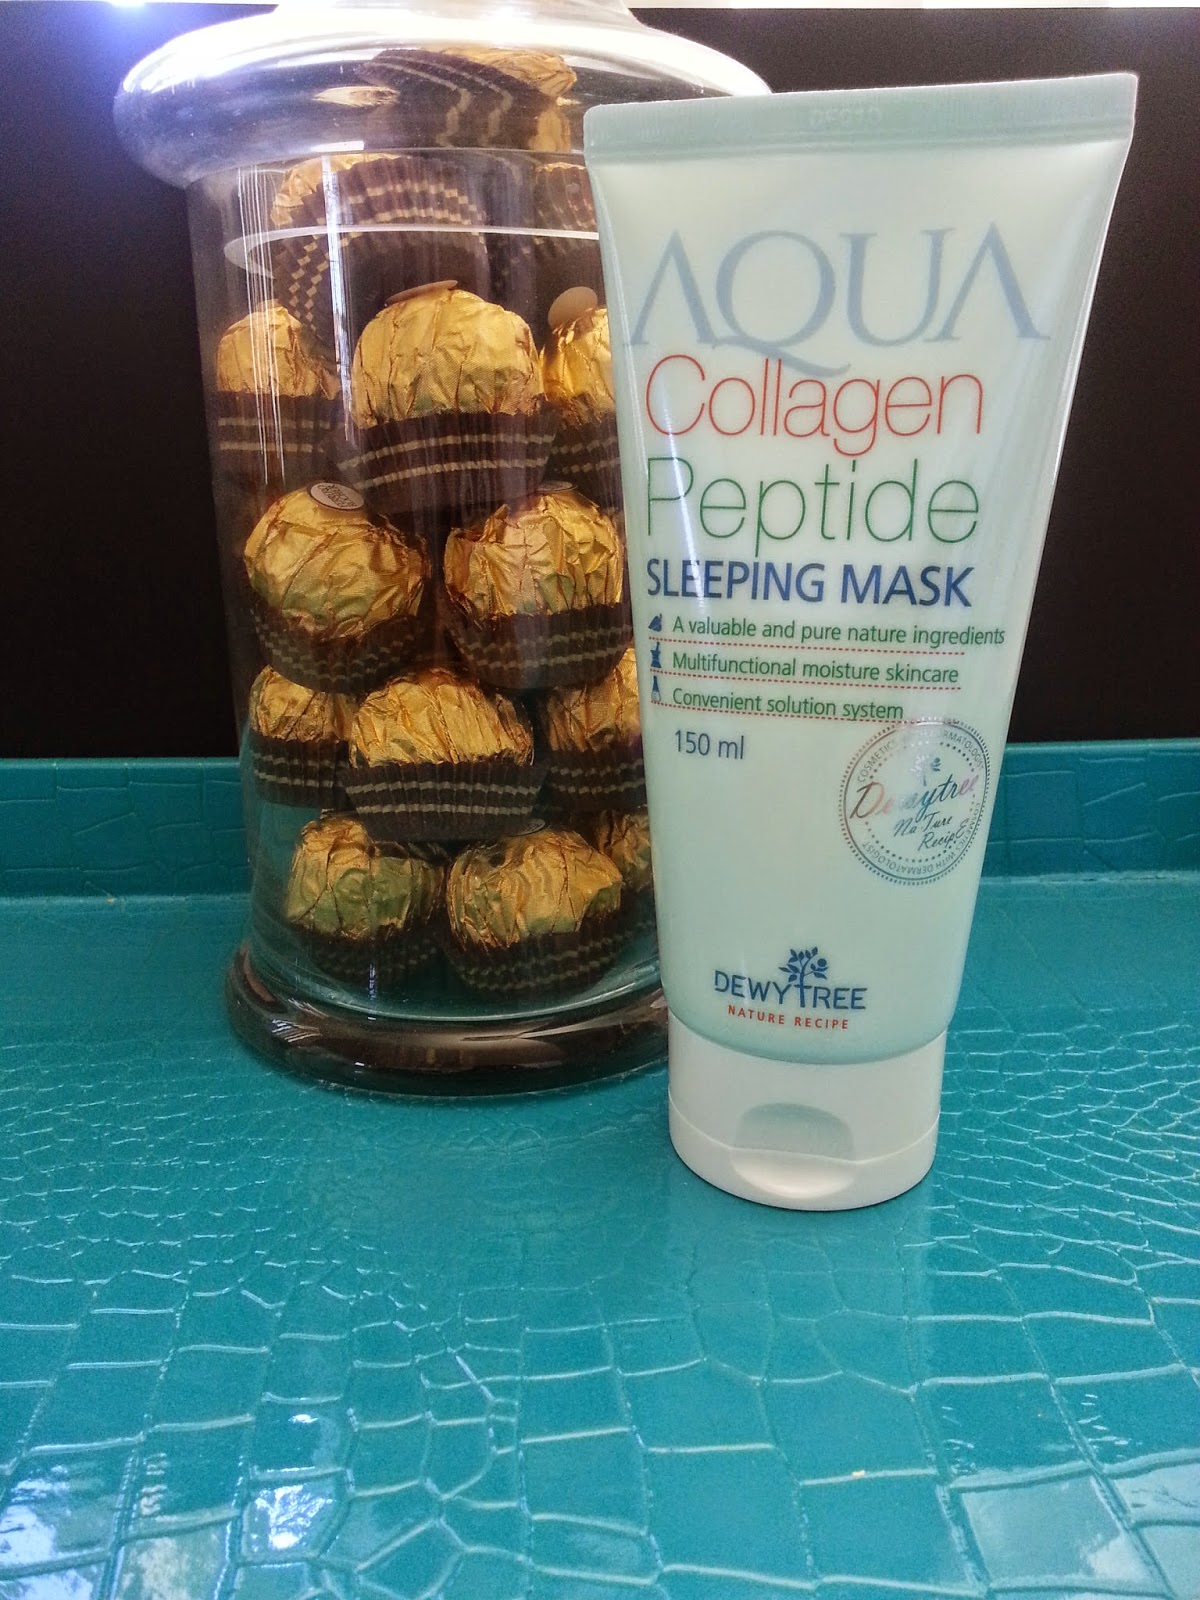 Dewytree Aqua Collagen Peptide Sleeping Mask